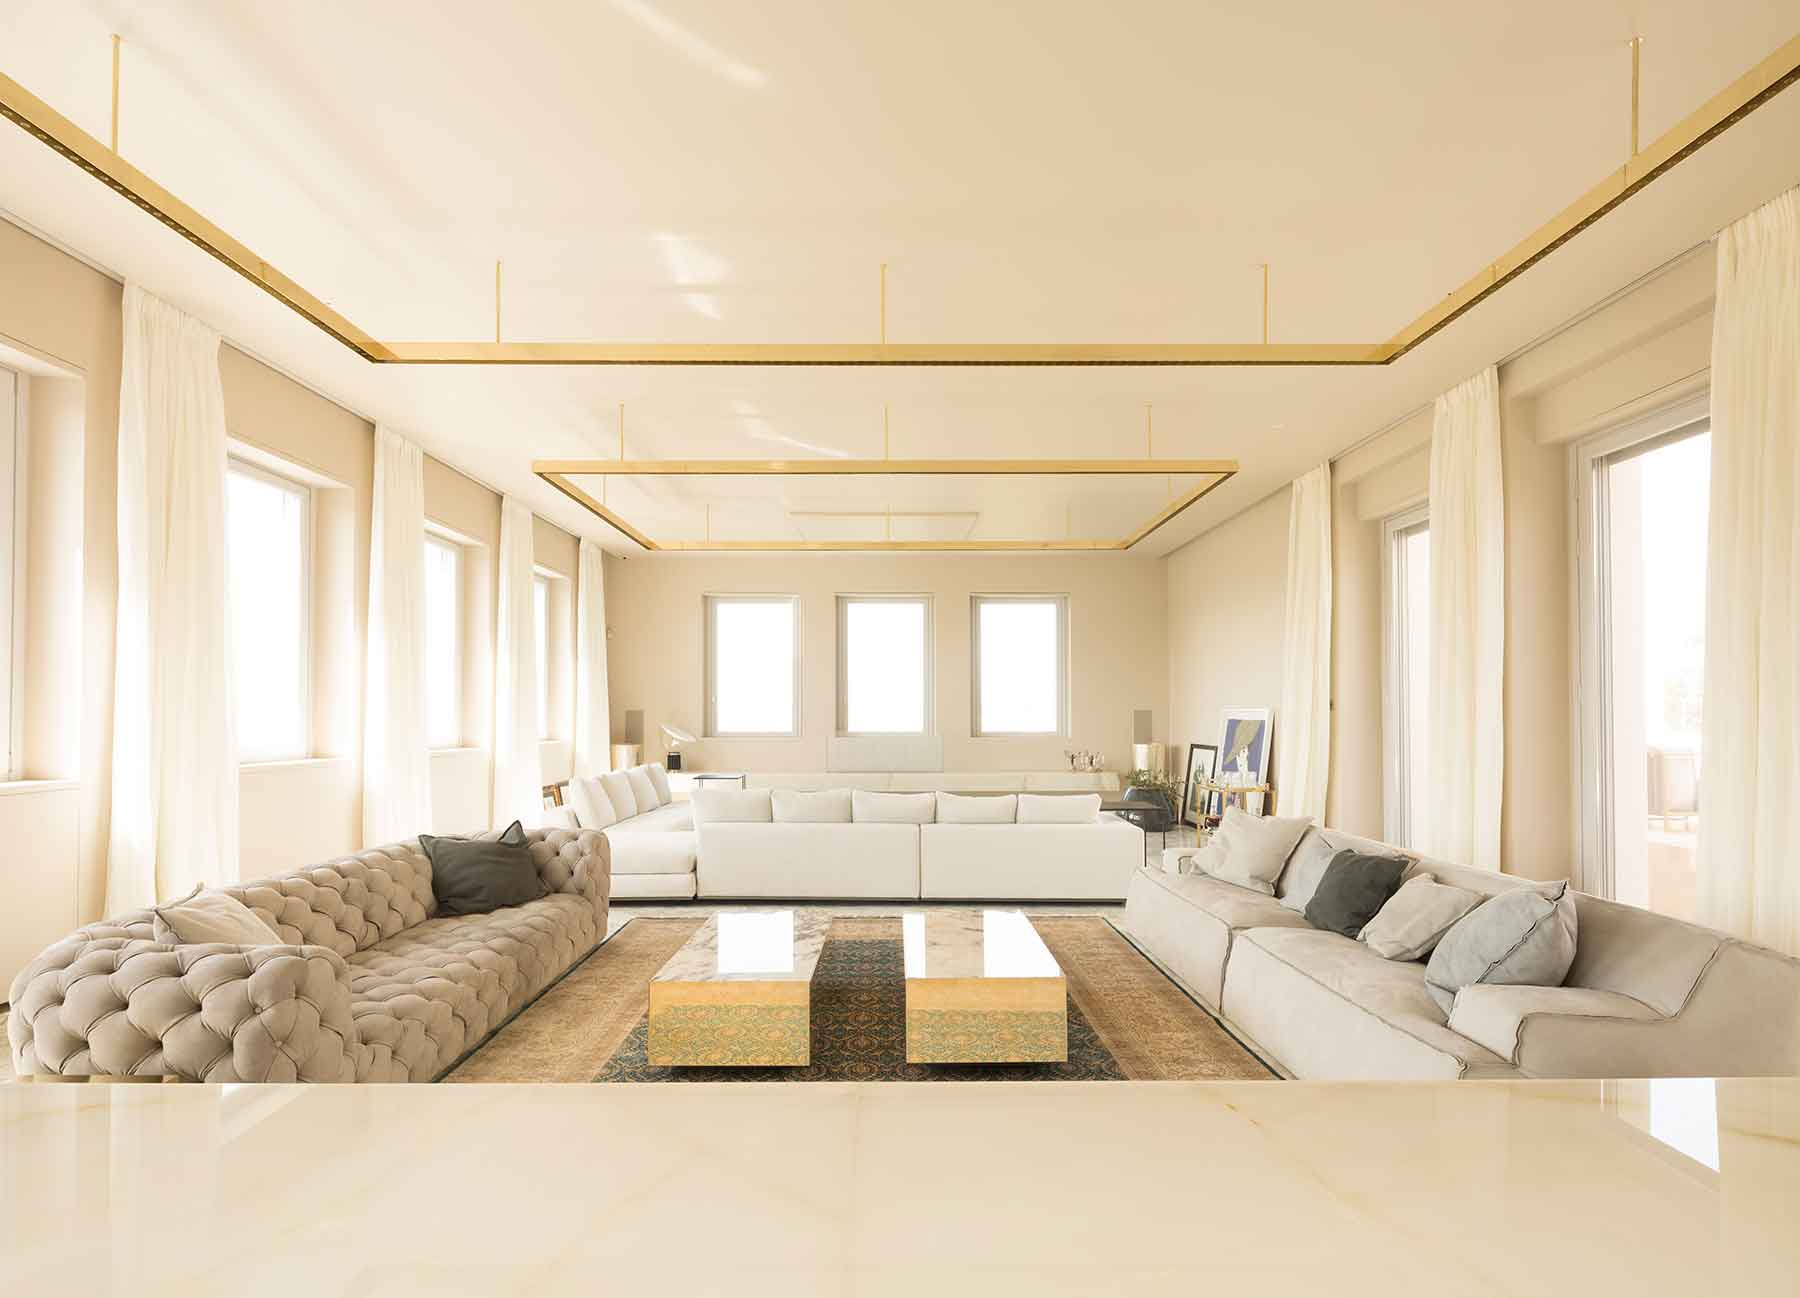 L'abitazione dispone di ampi spazi